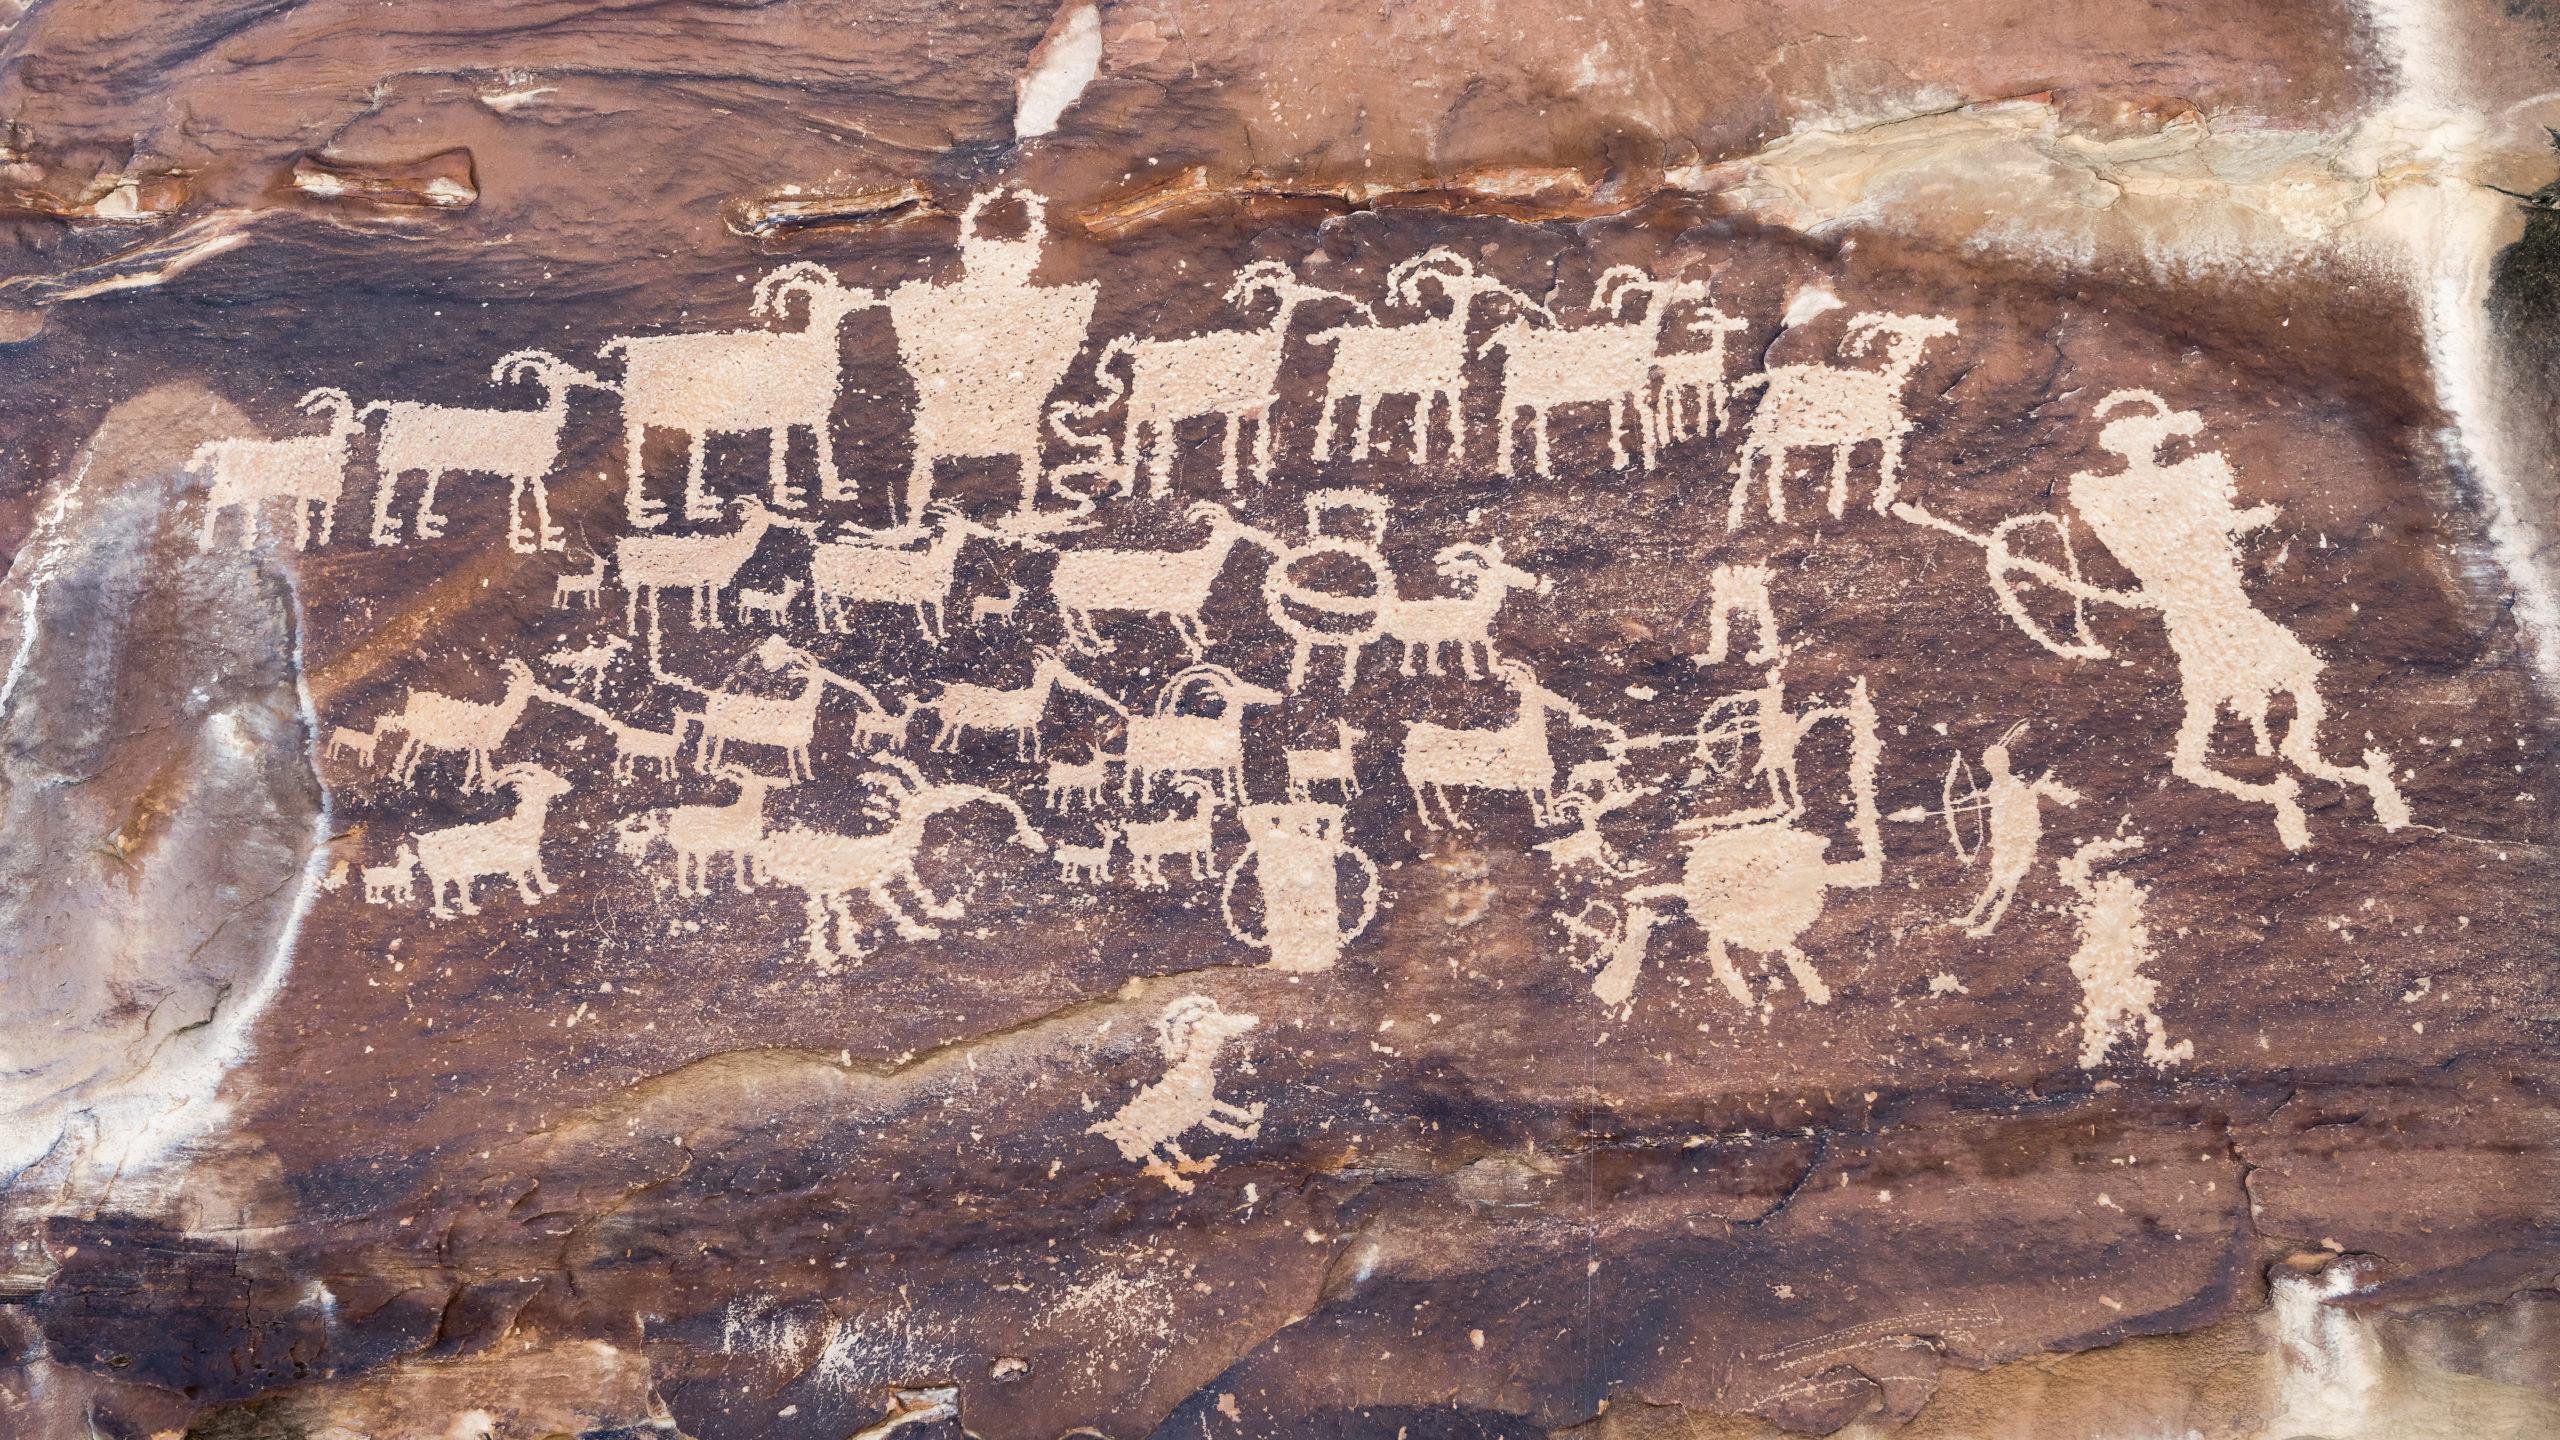 Fremont Indian petroglyphs in Ashley National Forest